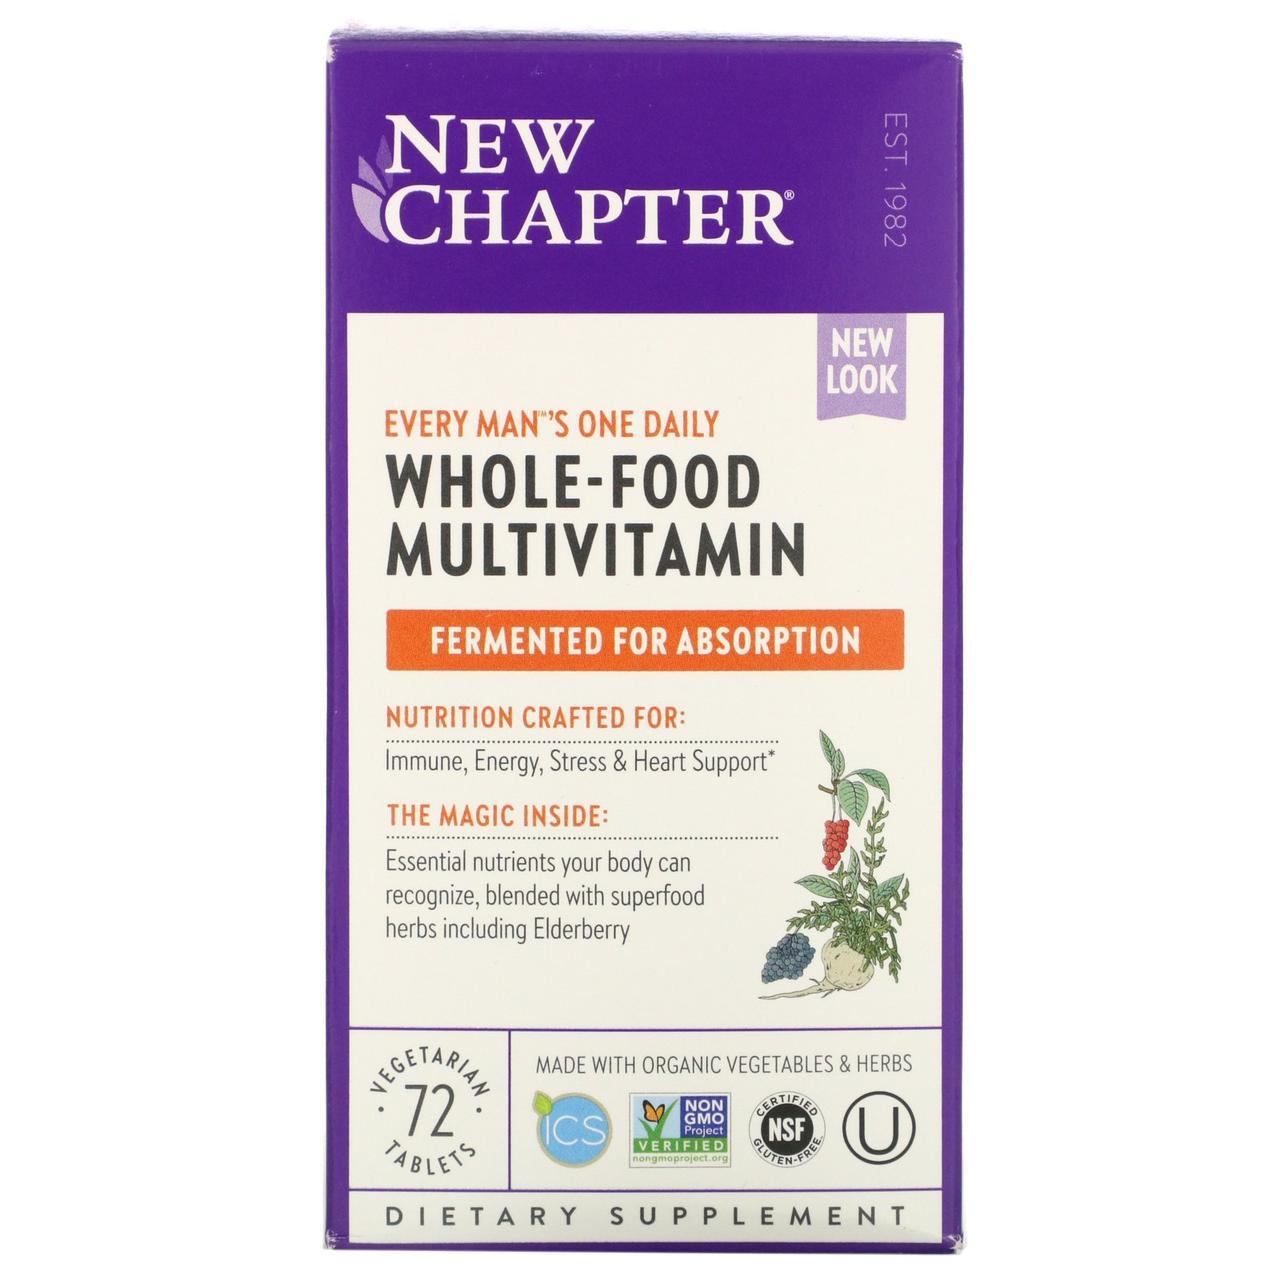 Ежедневные витамины для мужчин New Chapter, мультивитамин, 72 табл.